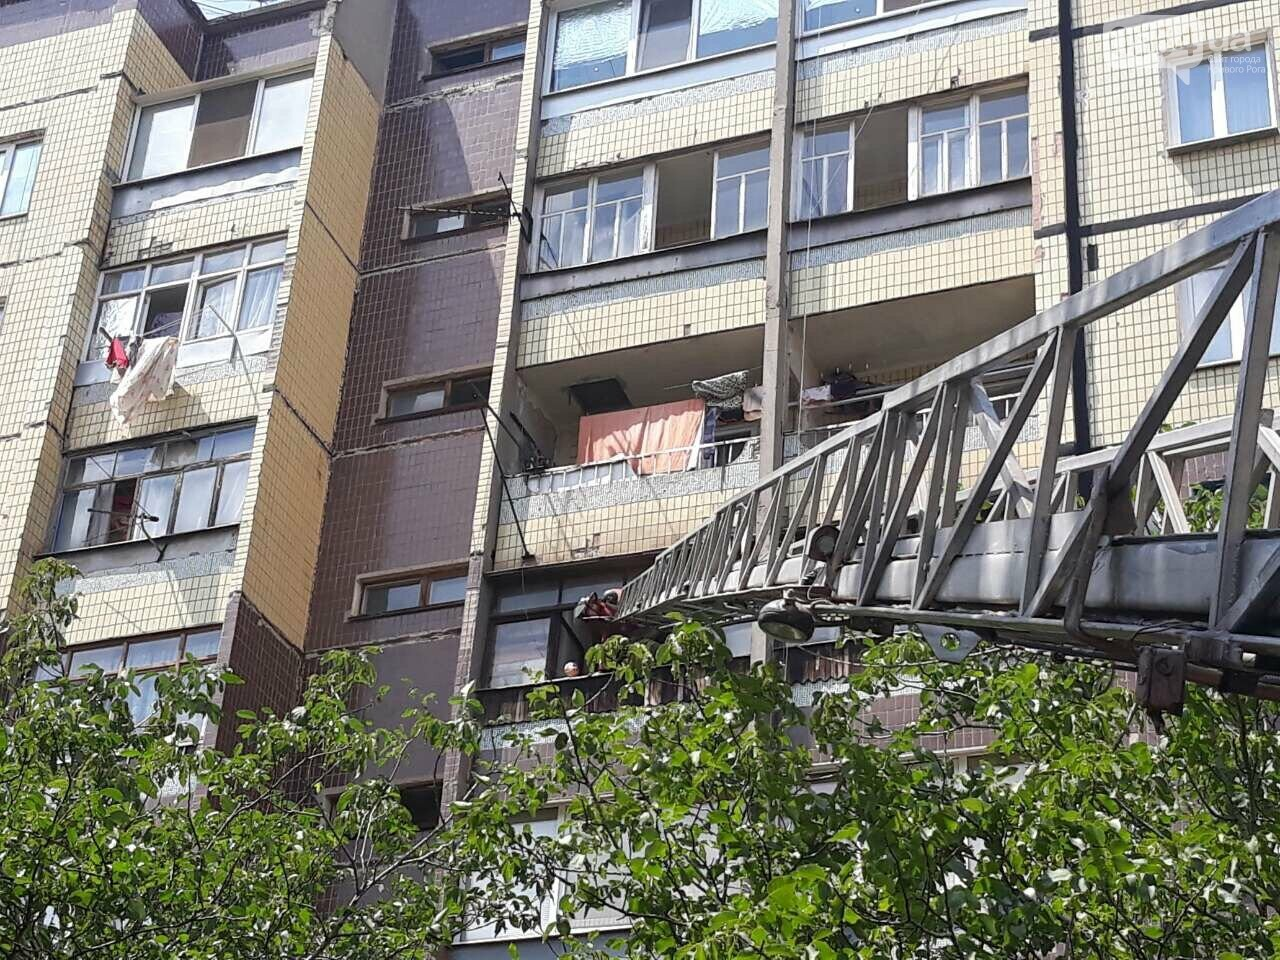 Один дома: В Кривом Роге 4-летний мальчик оказался запертым на балконе 6 этажа, - ФОТО, ВИДЕО, фото-2